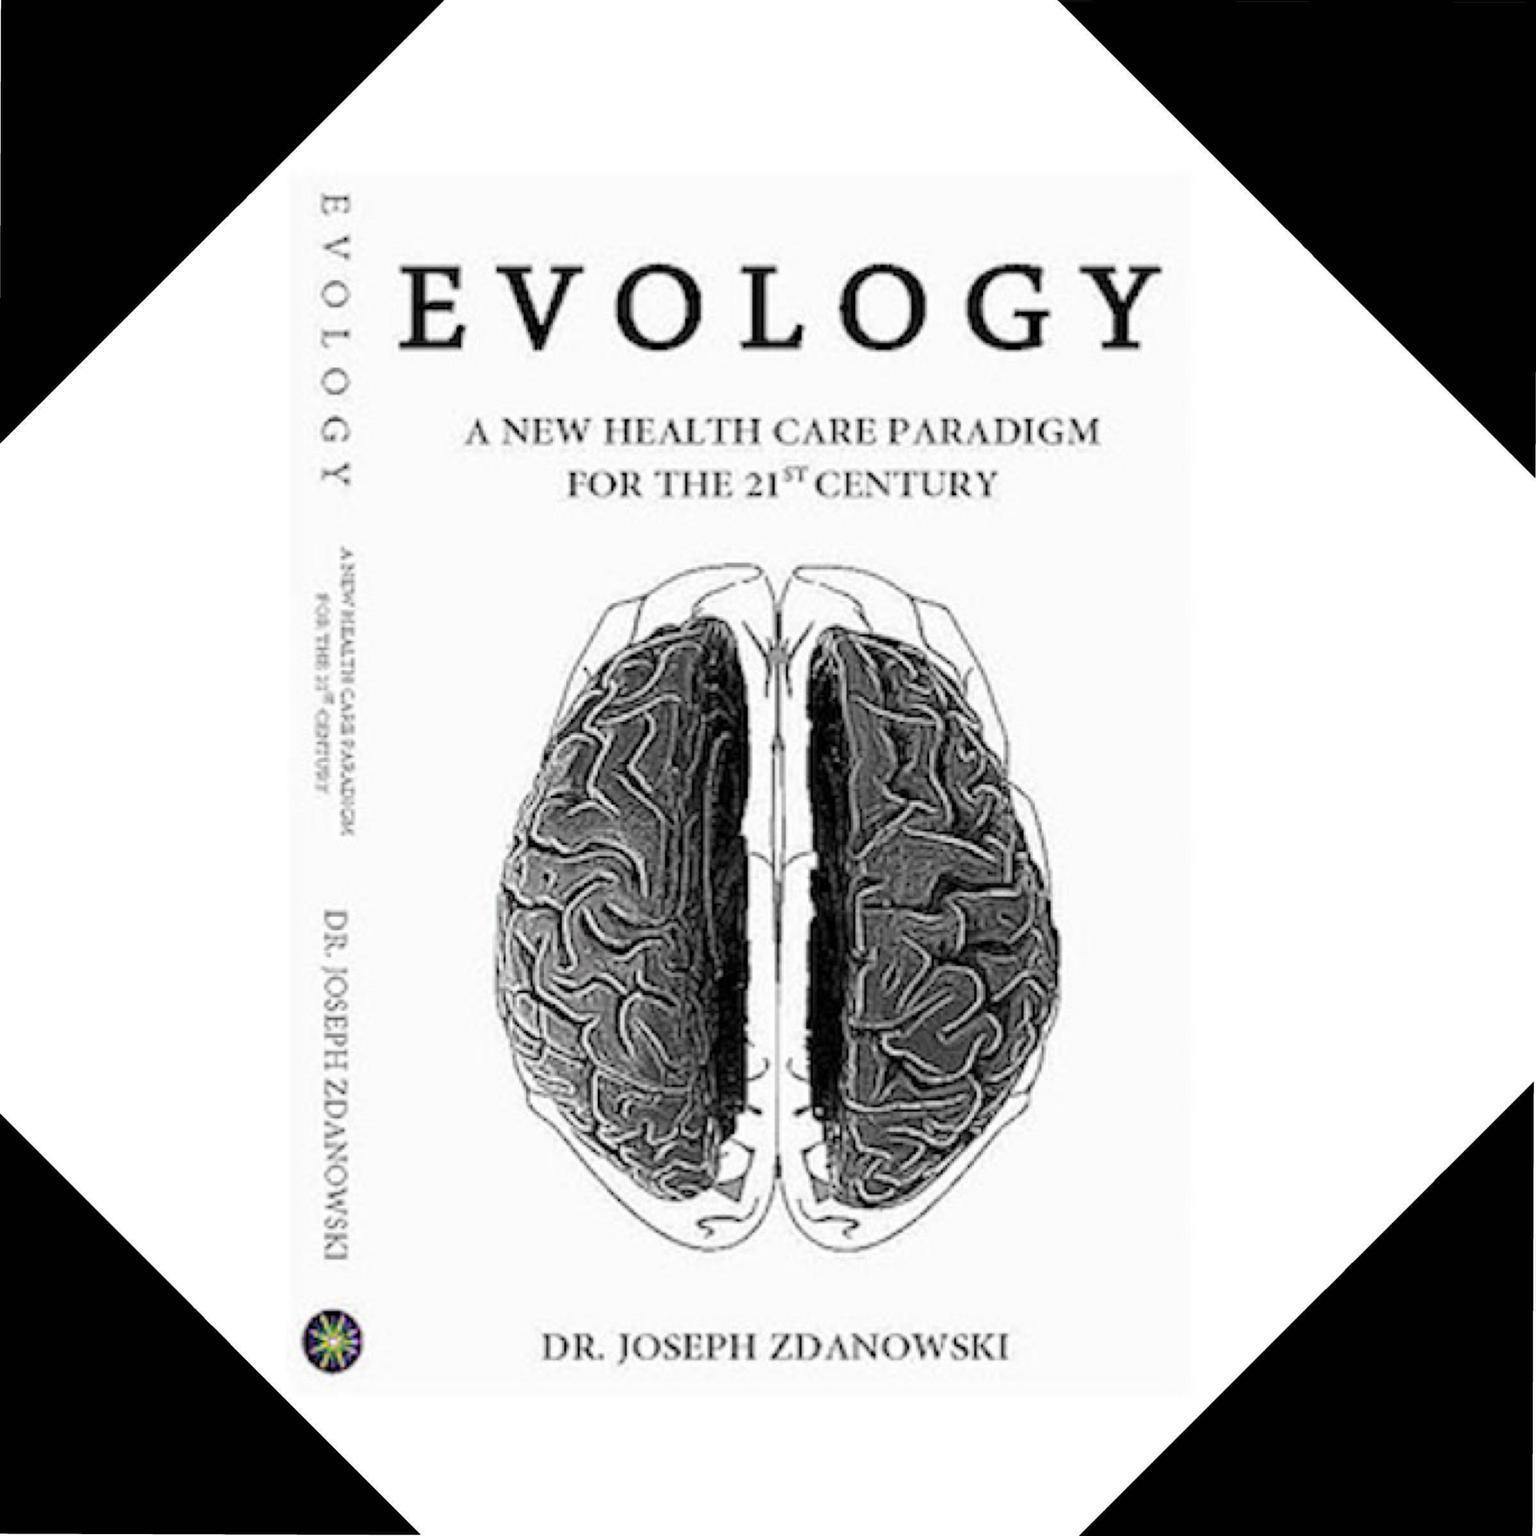 EVOLOGY, A New Health Care Paradigm For the 21ST Century Audiobook, by Joseph Zdanowski